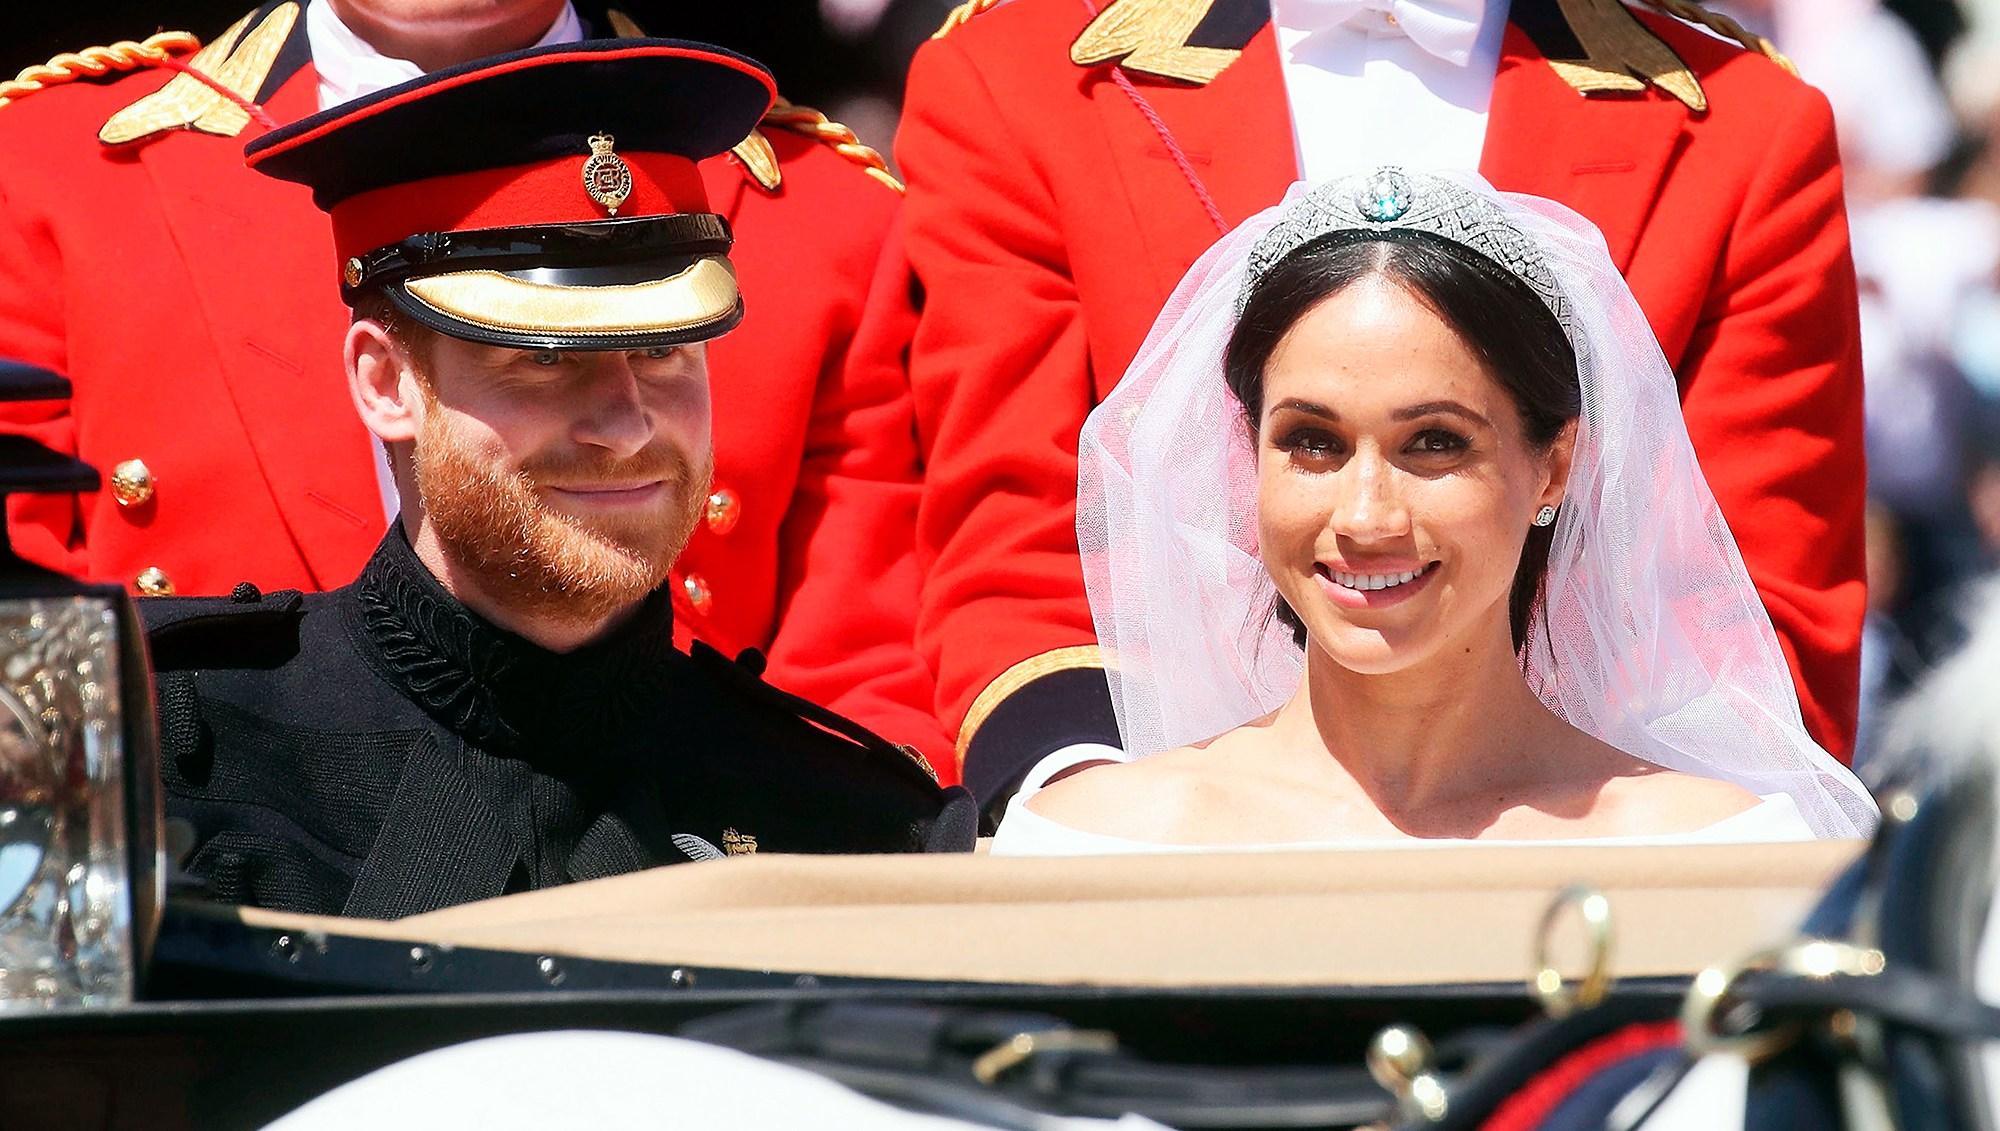 Prince Harry Meghan Markle Royal Wedding Cake Revealed